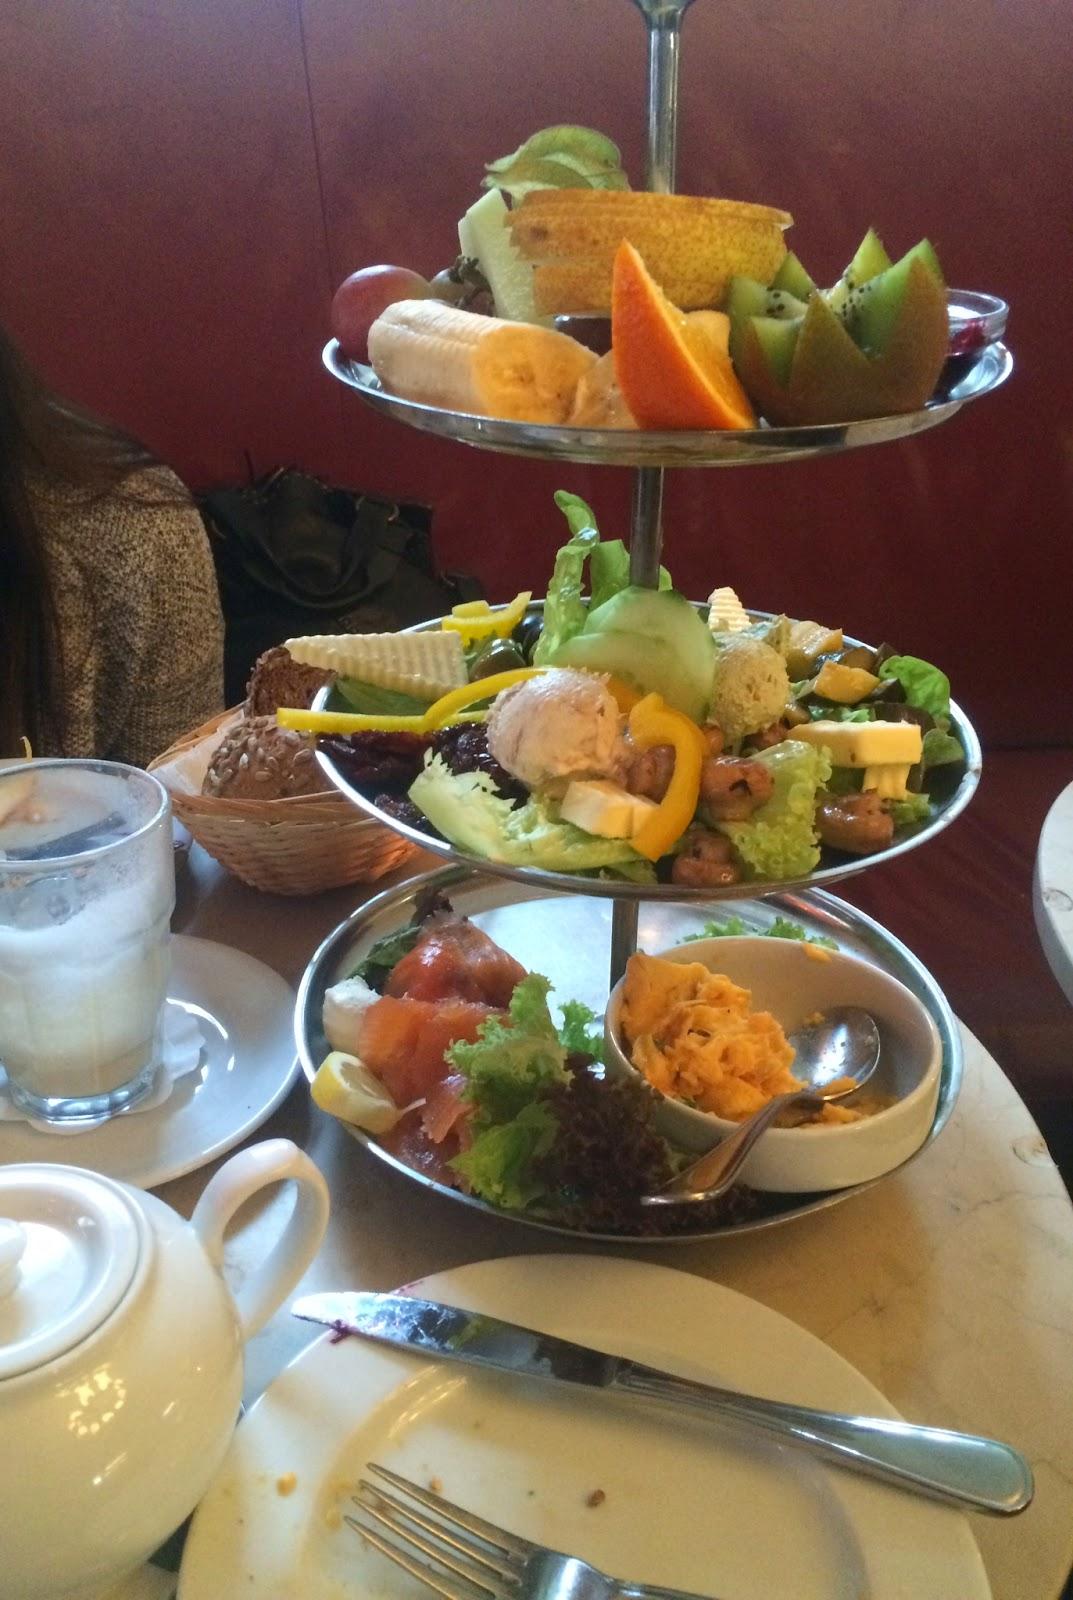 Breakfast tower at Cafe Anna Blum